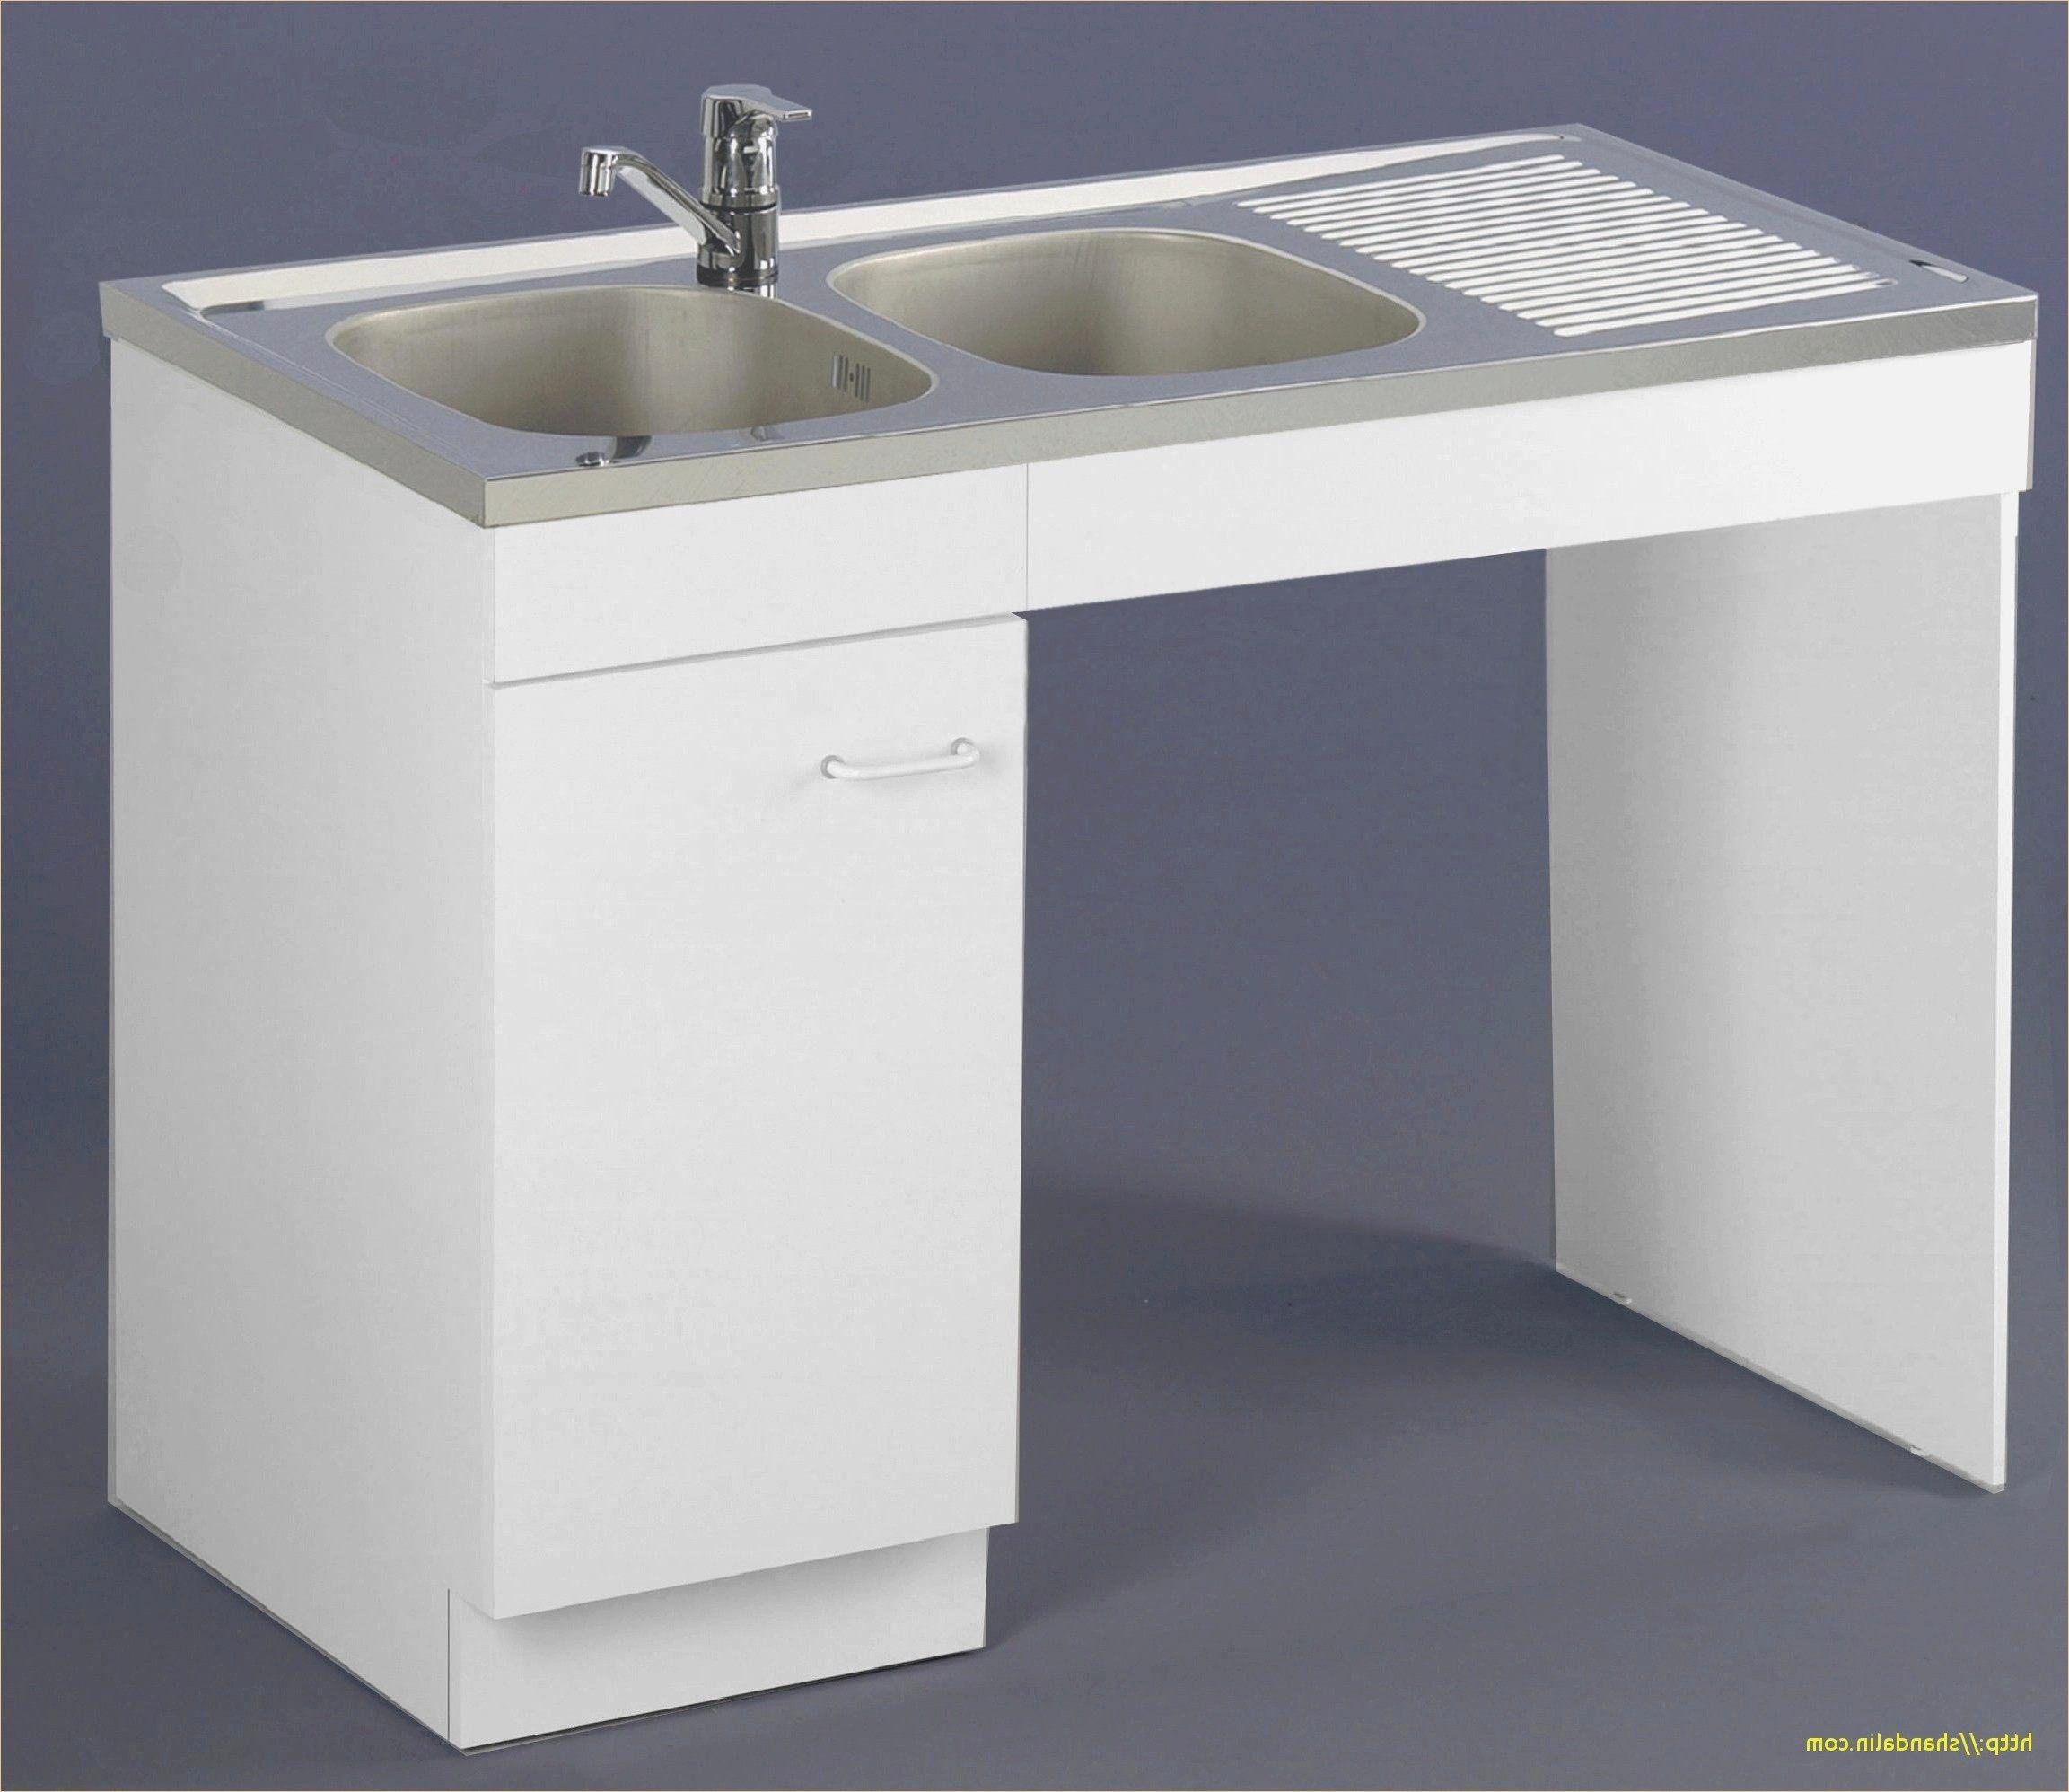 Meuble Vasque 60 Cm Frais Meuble Sous Evier 60 Cm Meuble avec Meuble Sous Evier Castorama